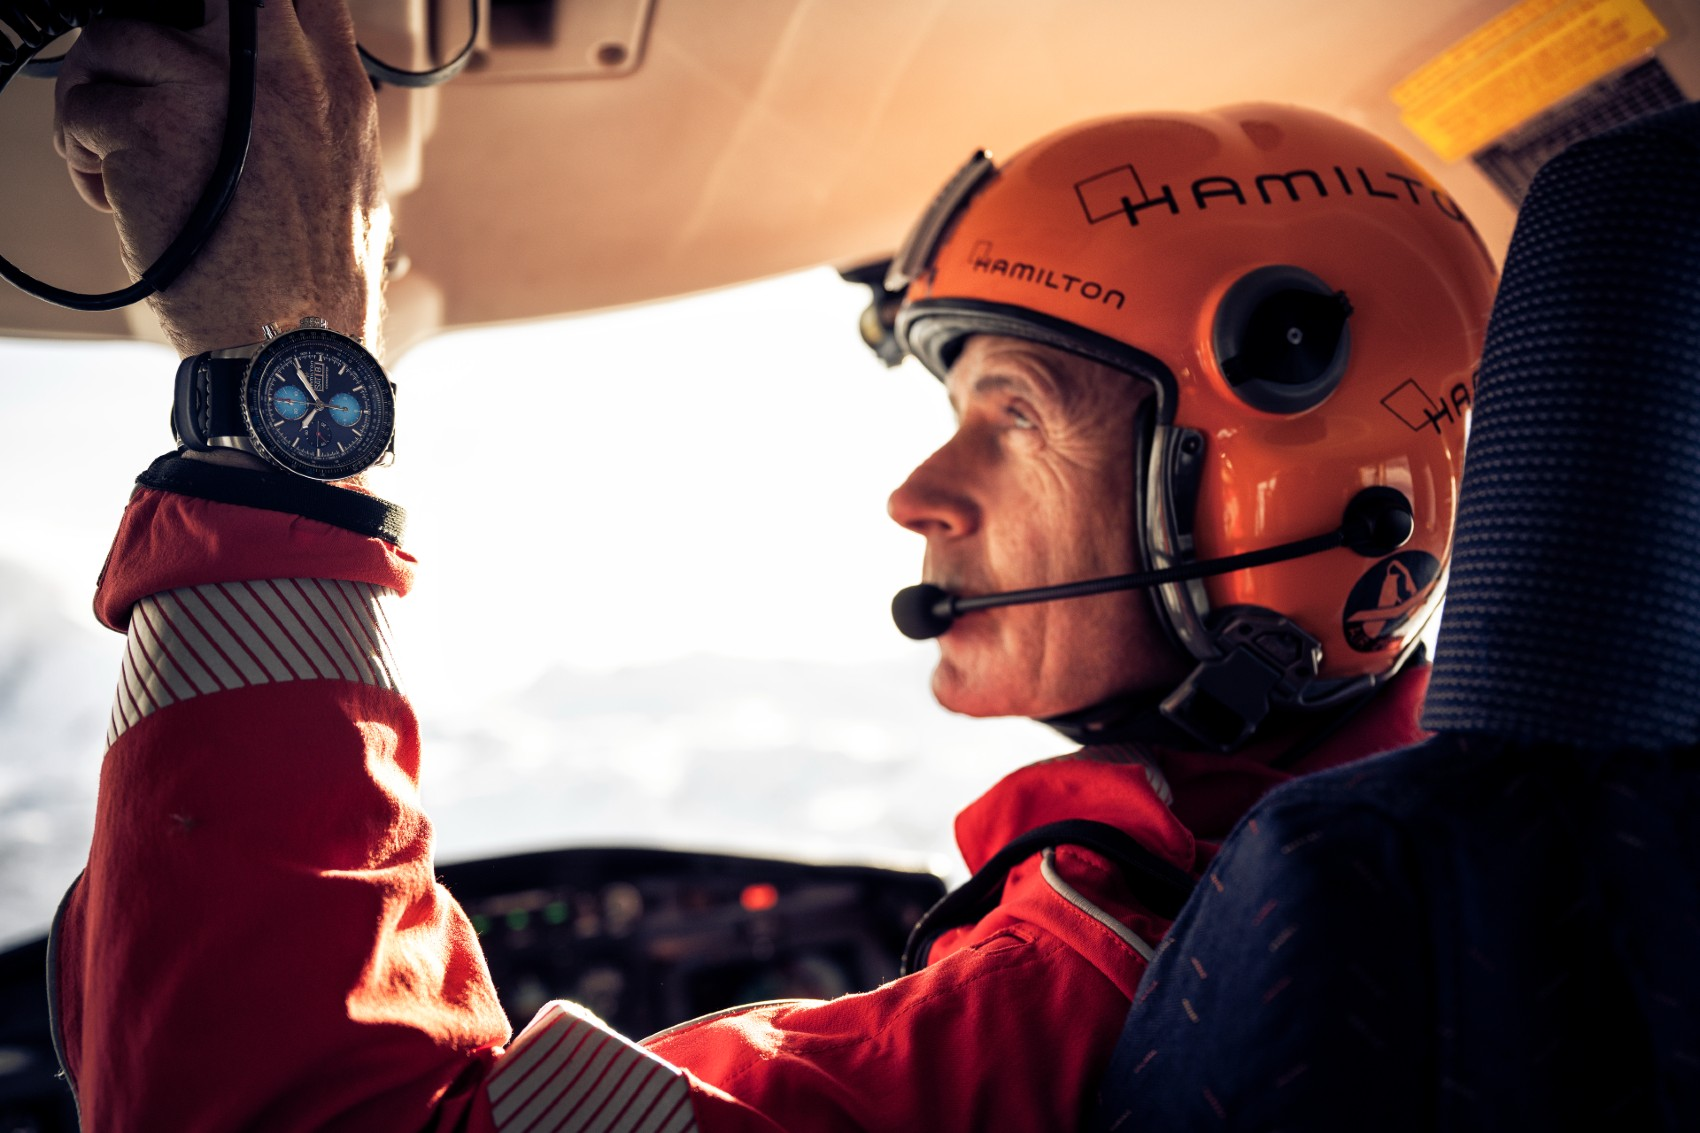 Khaki Aviation Converter Auto Chrono Air Zermatt Edition H76706730 Lifestyle 3 10926